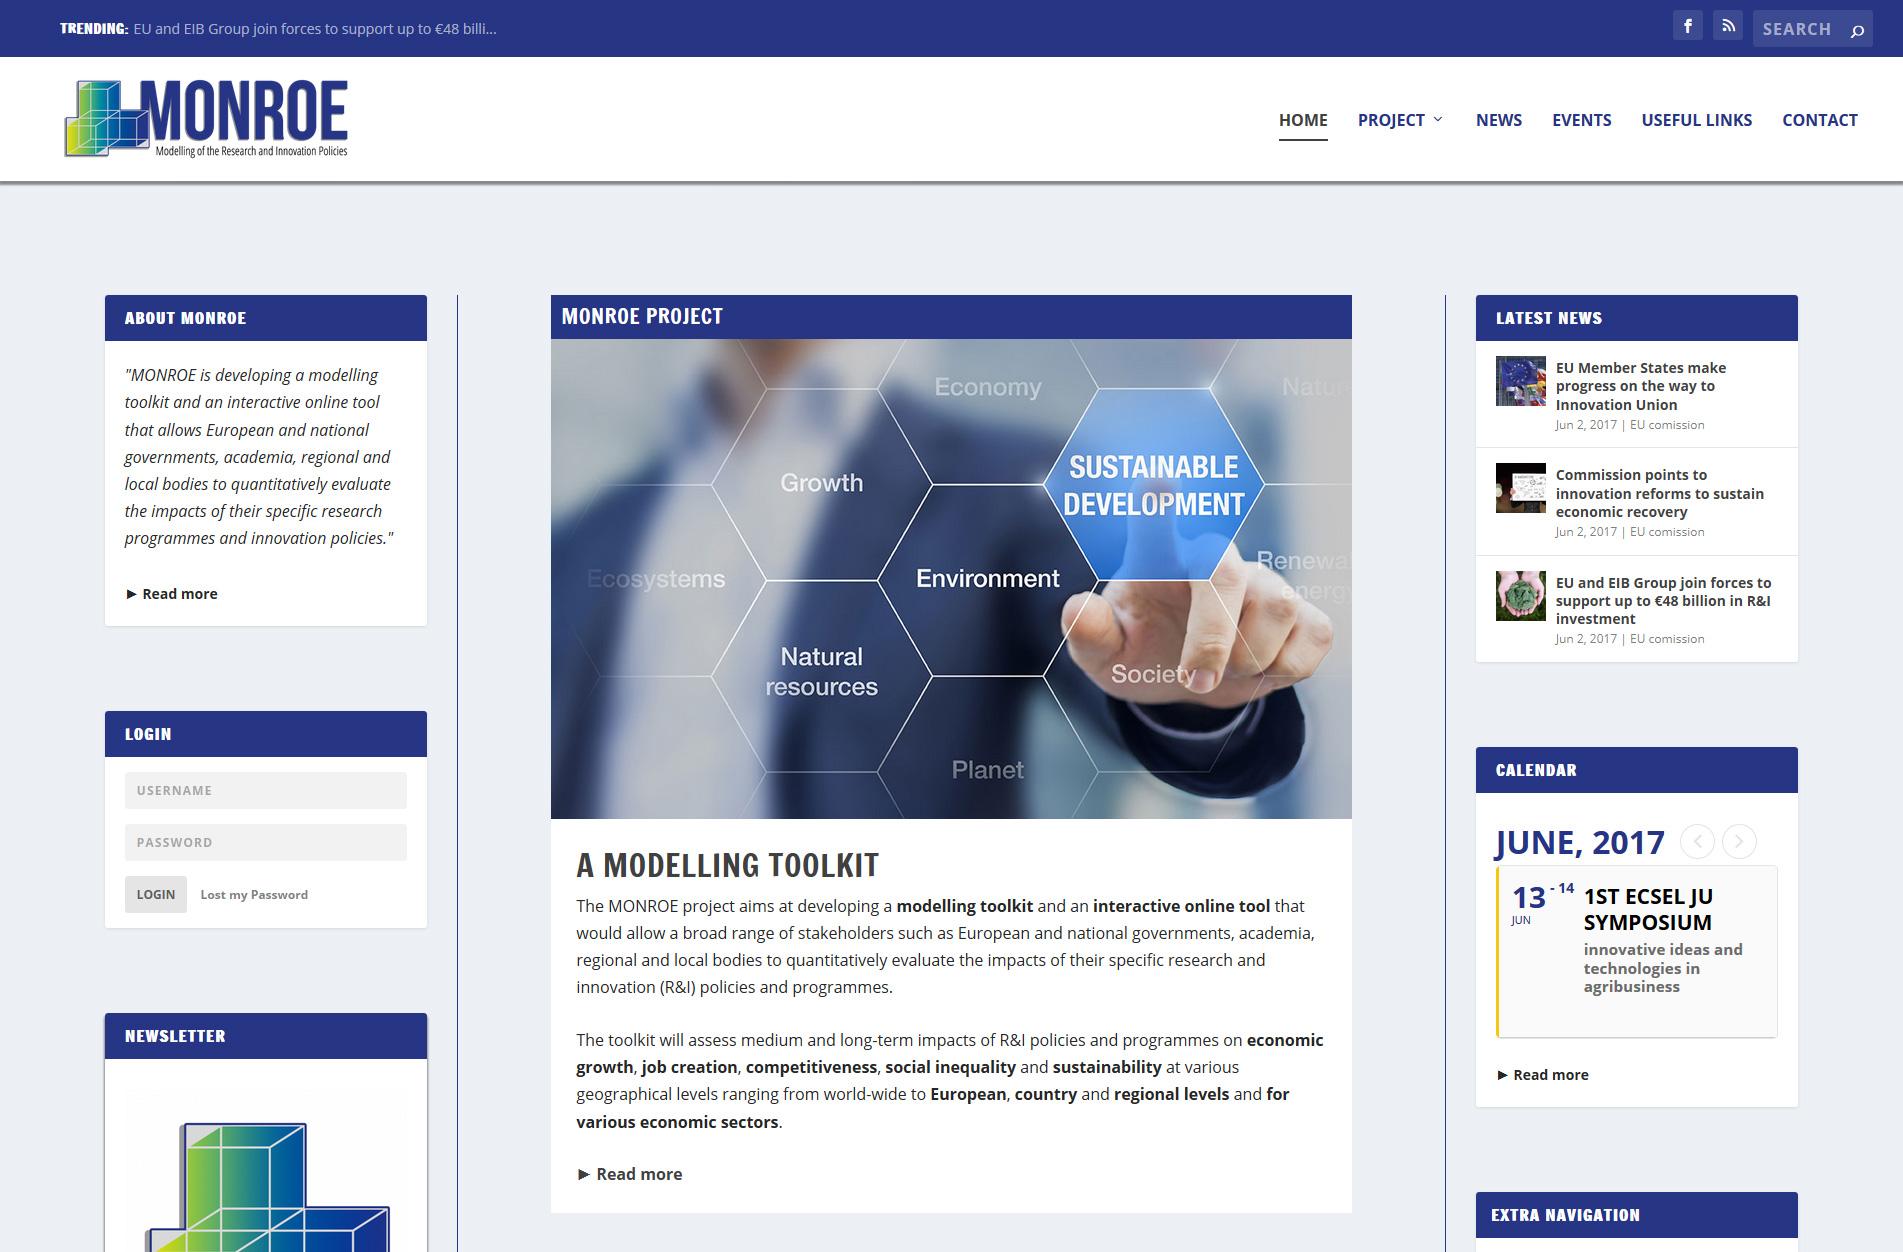 monroe-website-home